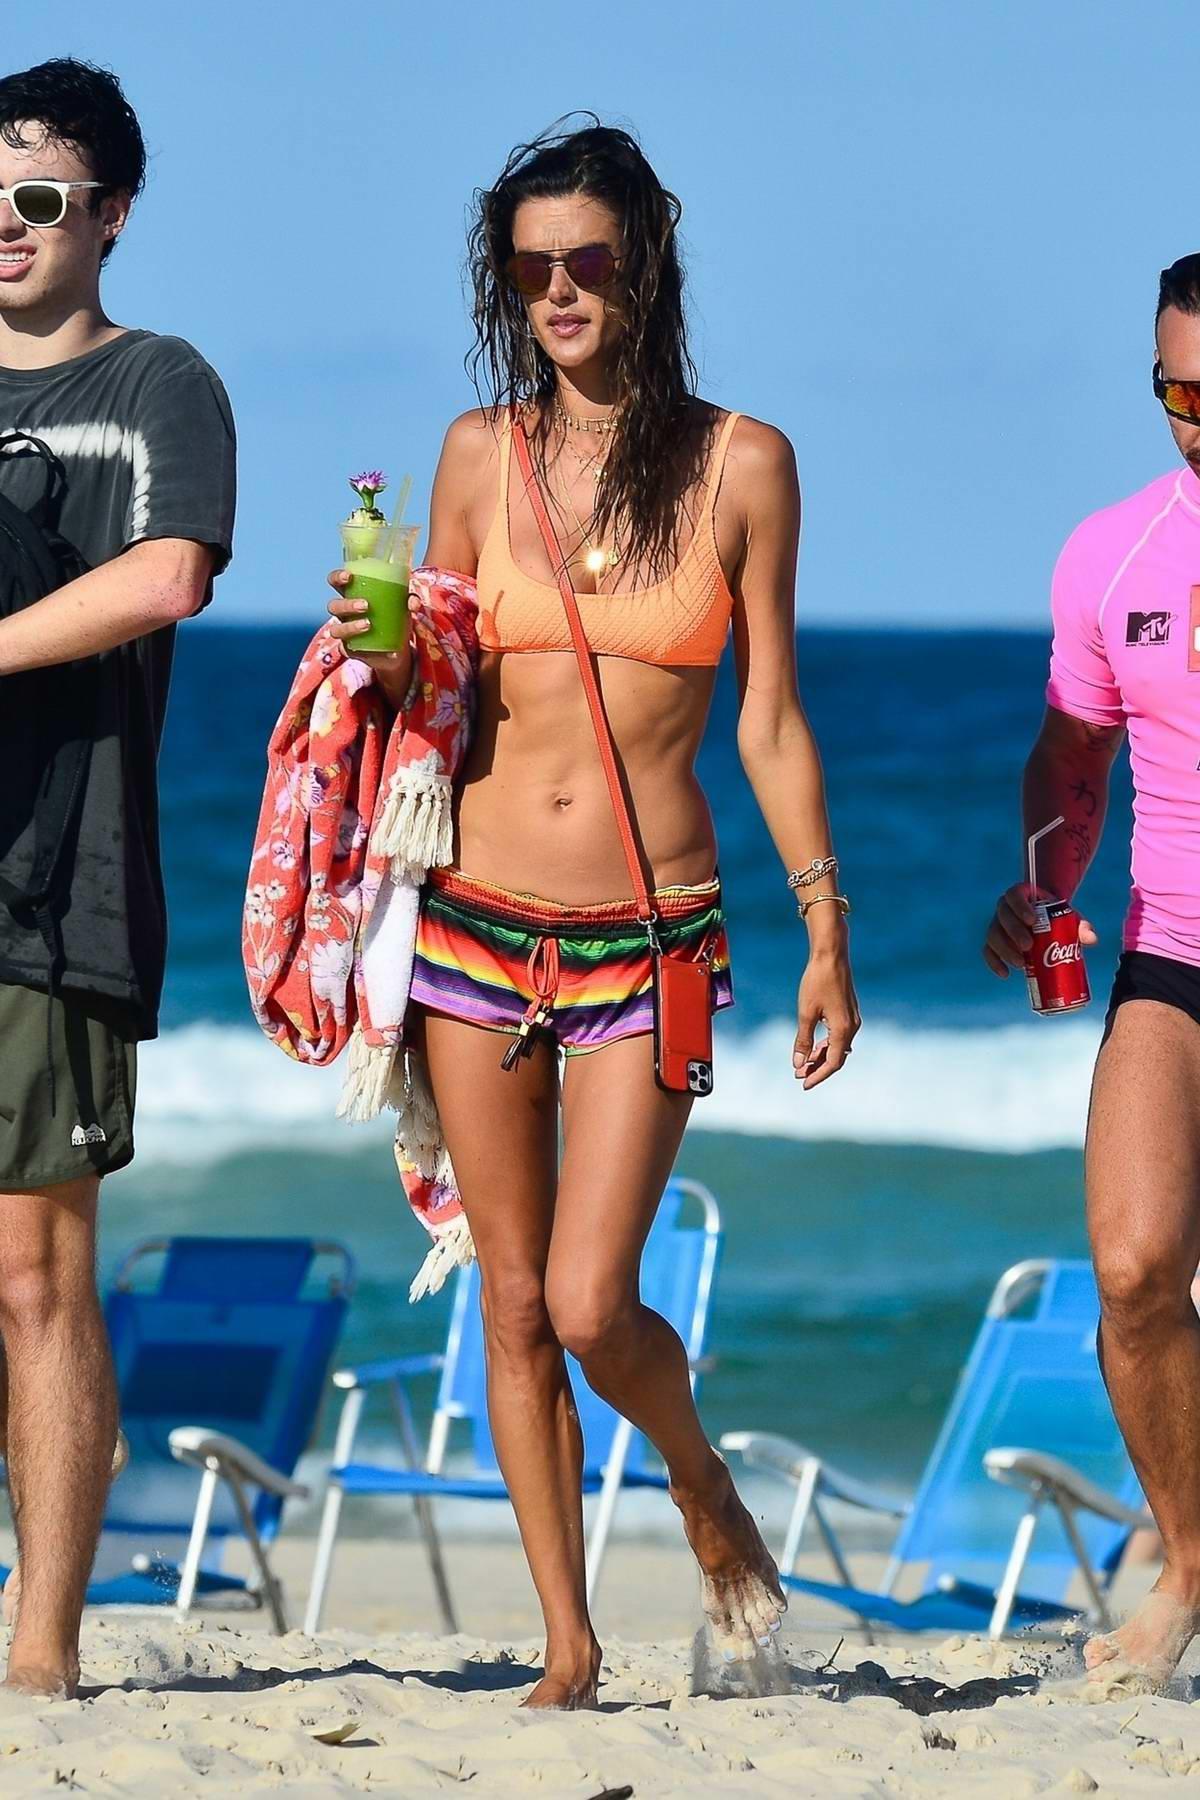 Alessandra Ambrosio flaunts her stunning figure in an orange bikini from her swimwear line in Florianopolis, Brazil